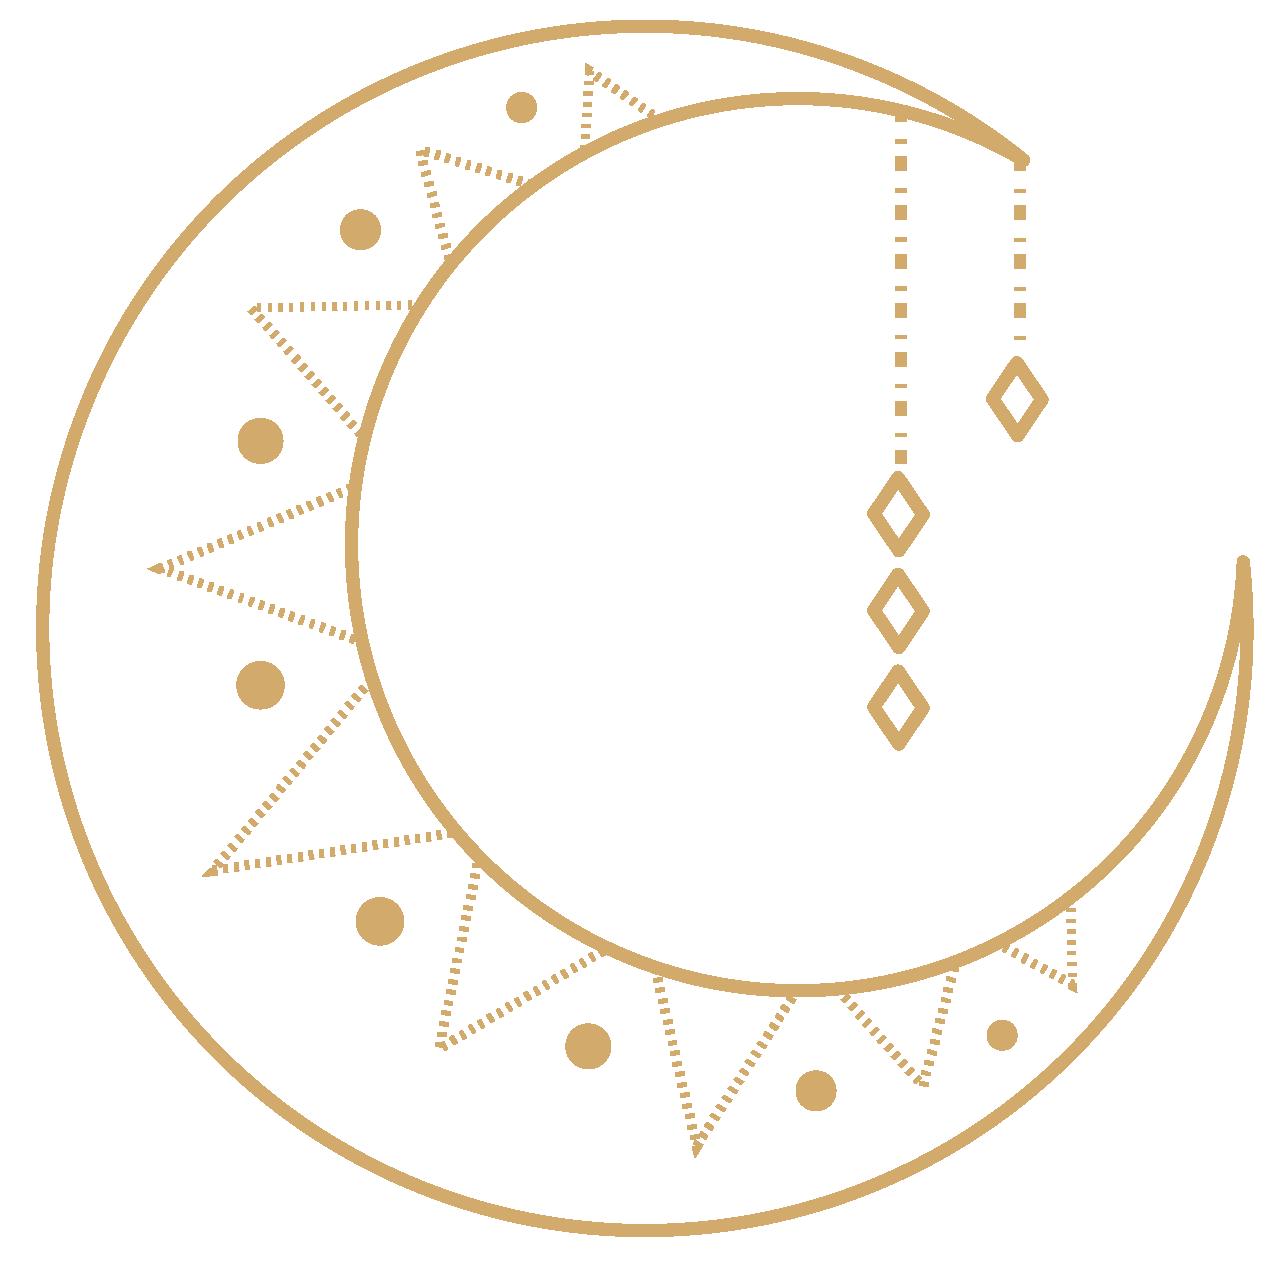 Tribal Shaman-Design-Kit-13.png